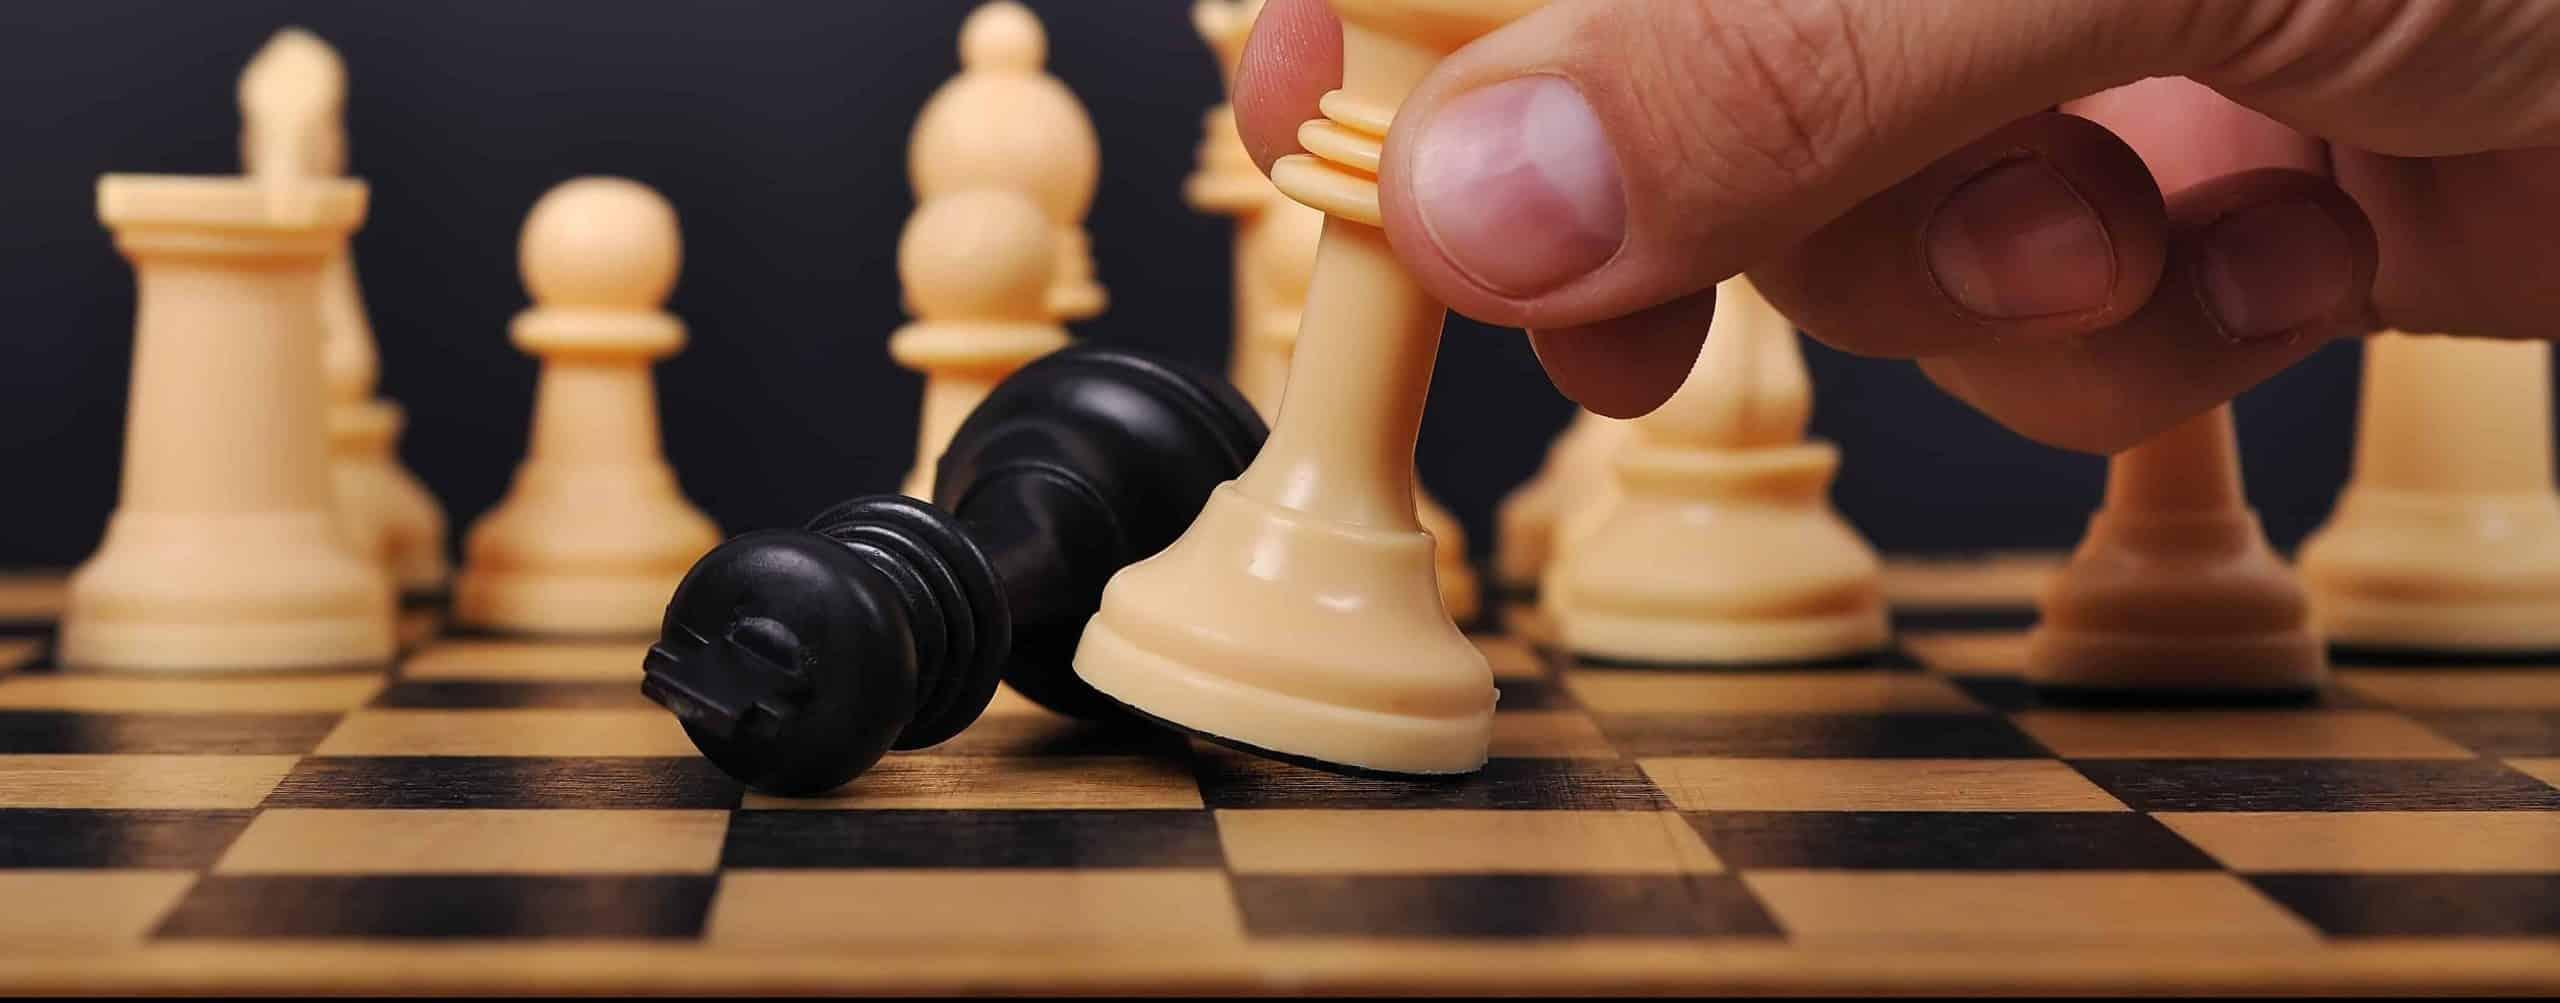 fichas del ajedrez